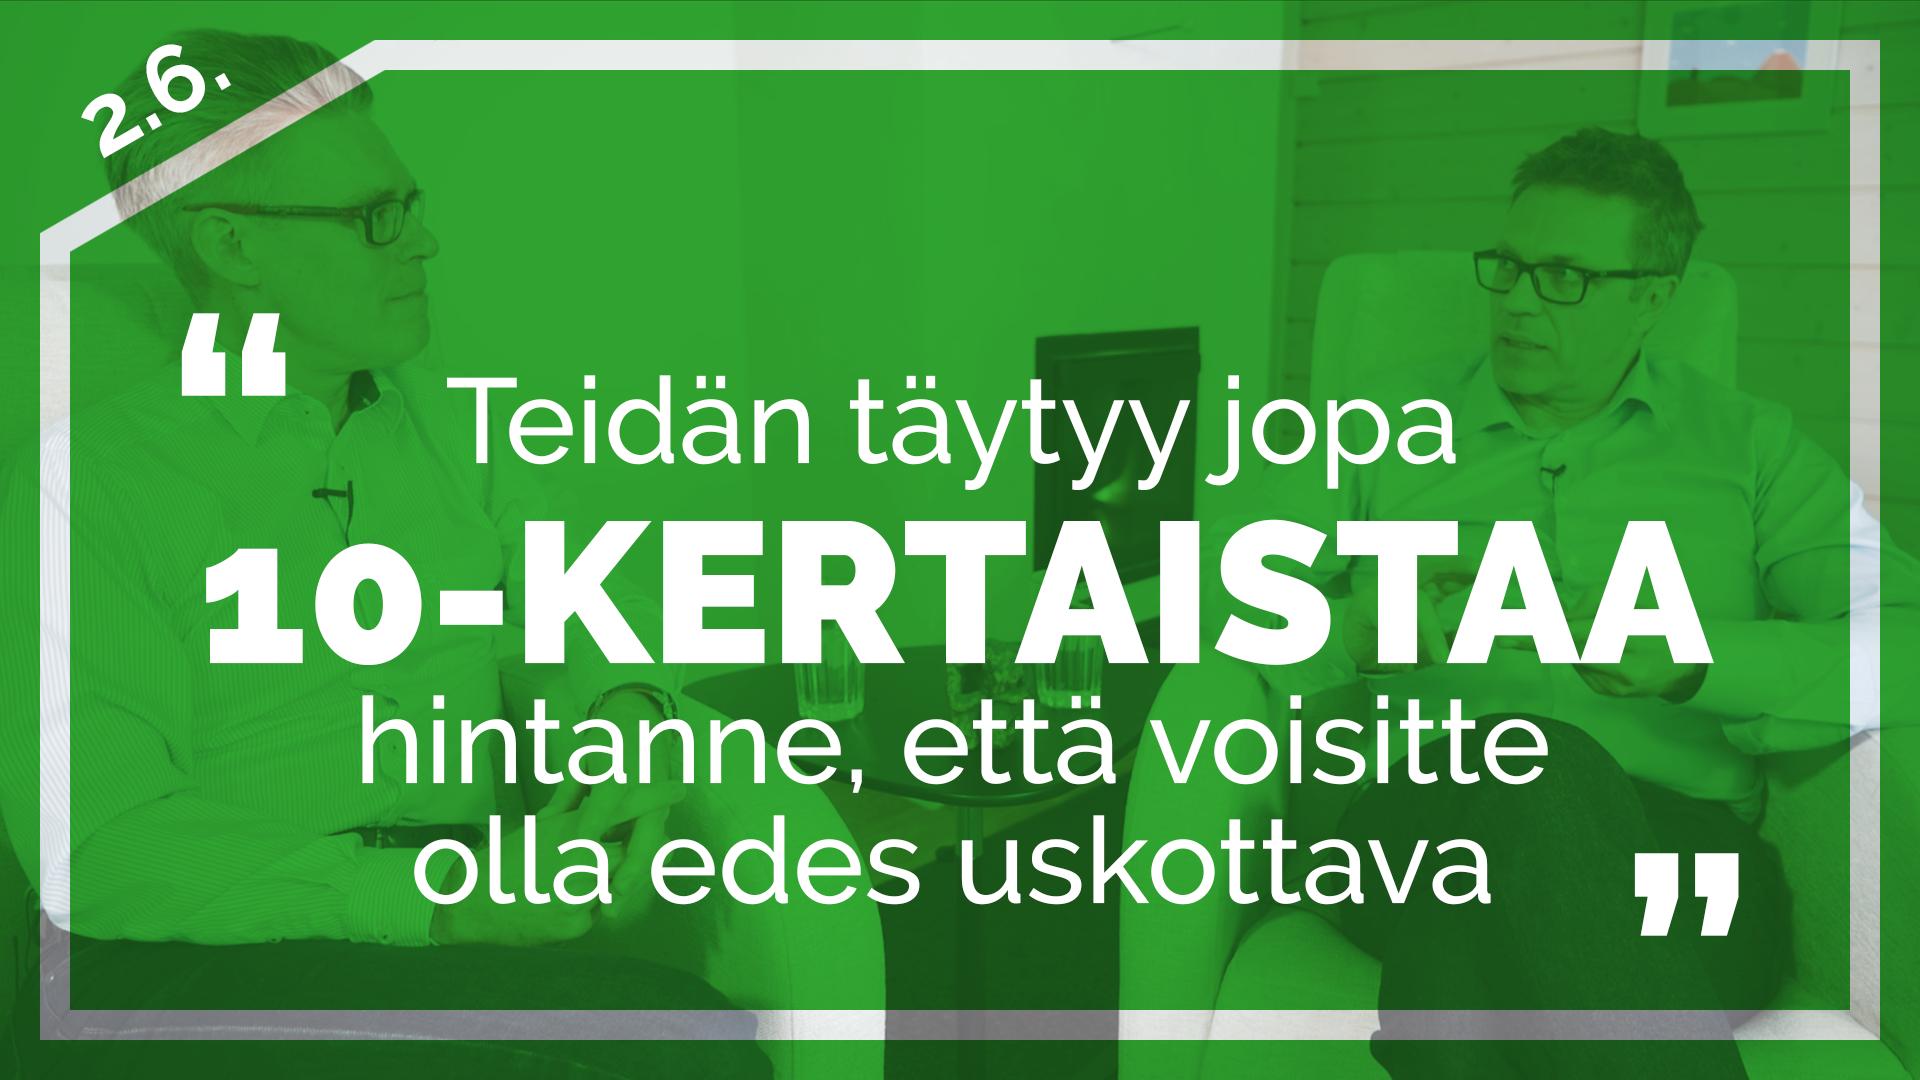 parantainen-sarasvuo-video3-pvm.png